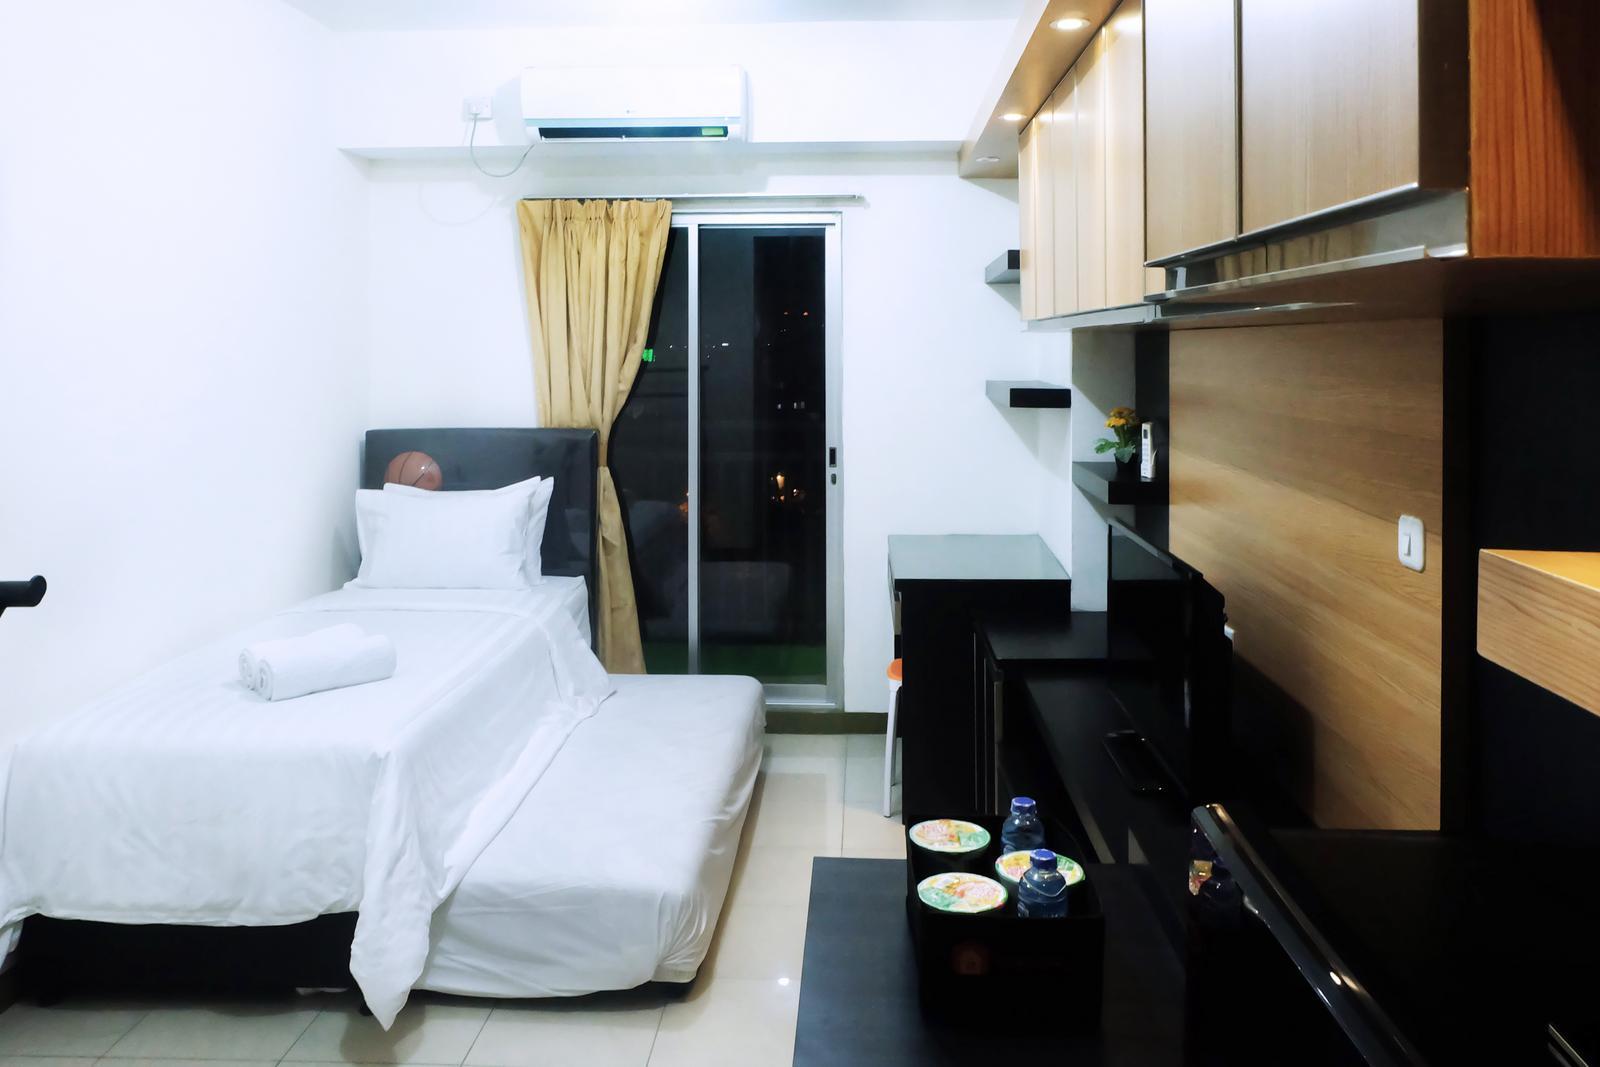 Apartemen Gading Greenhill - Cozy Studio Apartment Near Mall Kelapa Gading By Travelio